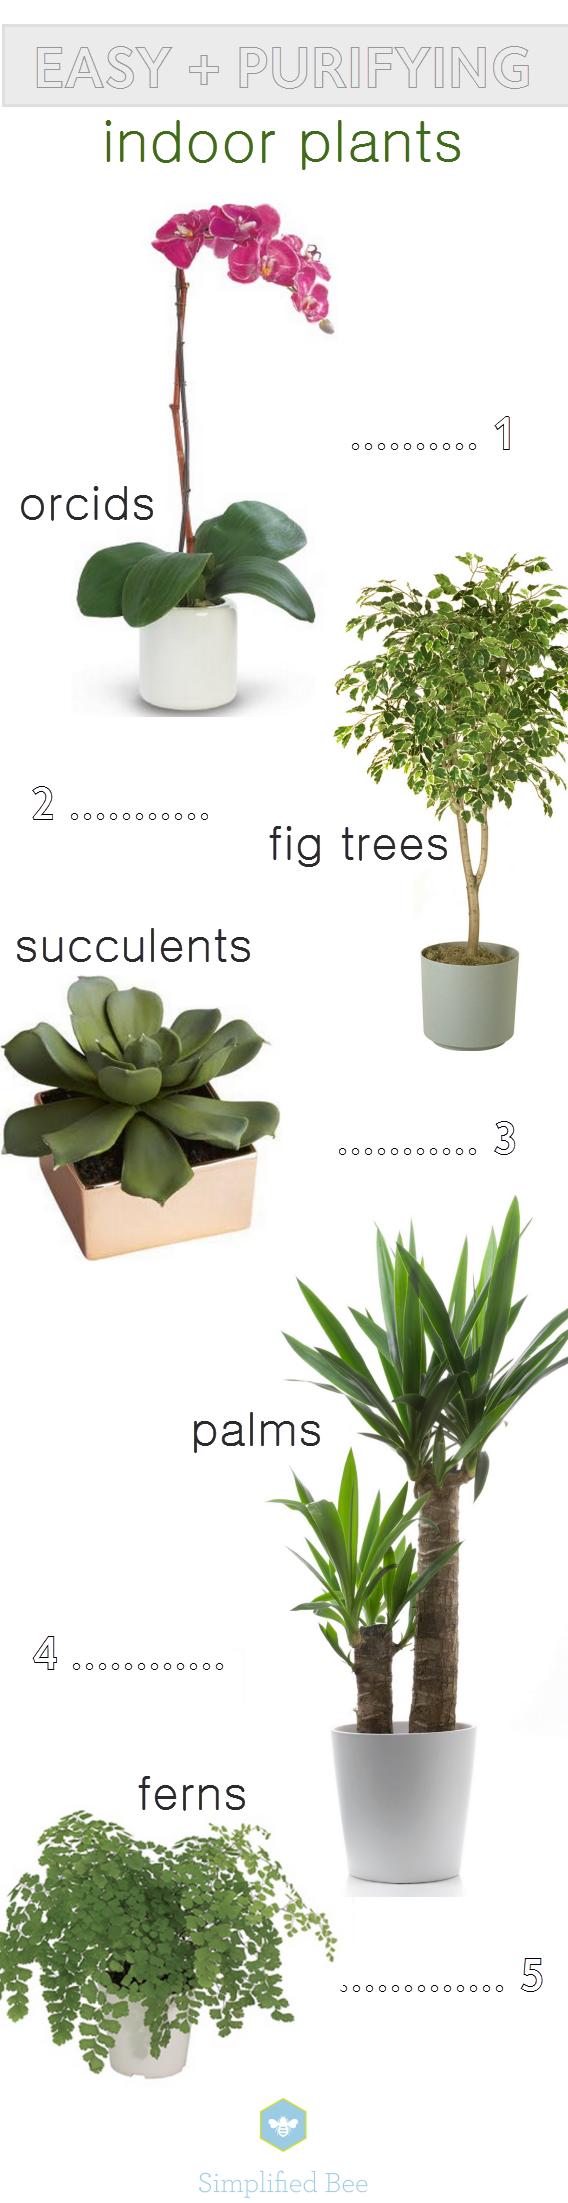 Easy Purifying Indoor Plants Www Simplifiedbee